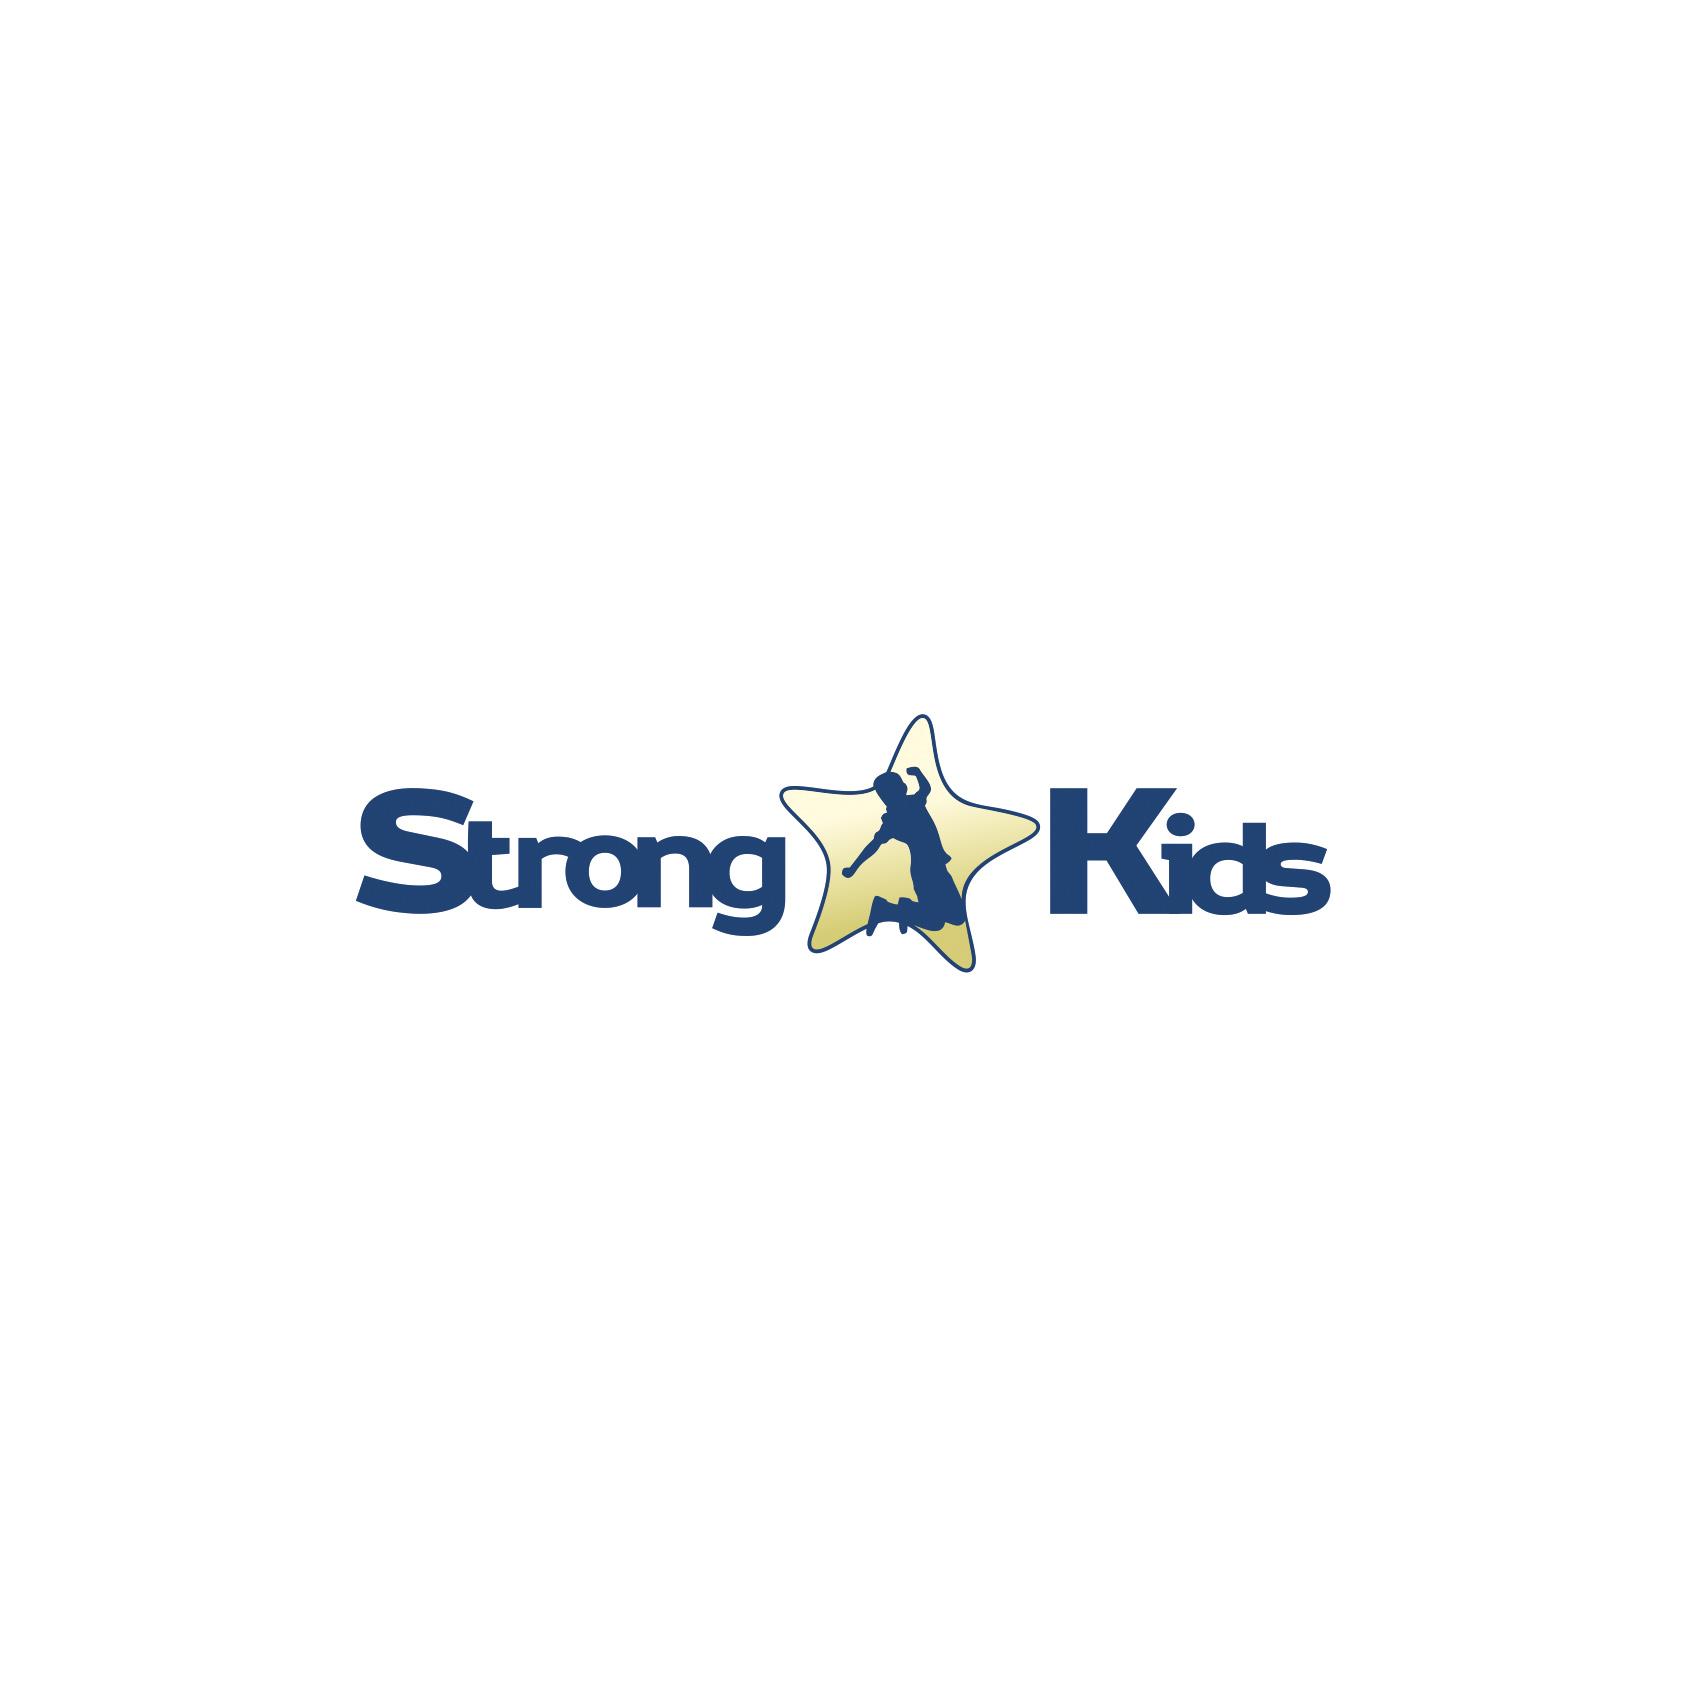 Логотип для Детского Интернет Магазина StrongKids фото f_4275c653f42820d0.jpg